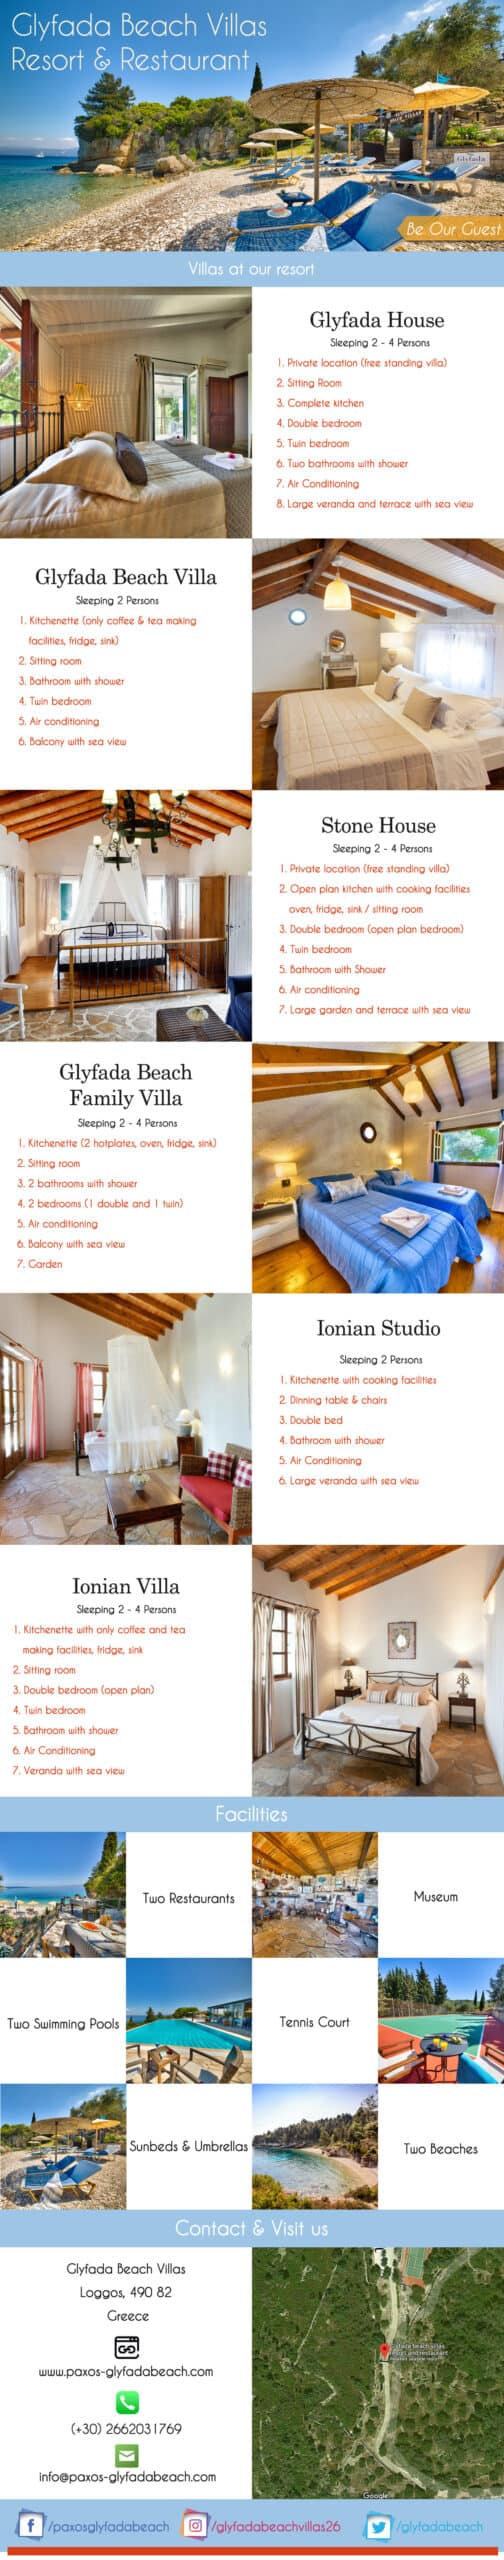 Luxury Villas In Paxos | Holiday Accommodation In Paxos | Glyfada Beach Villas